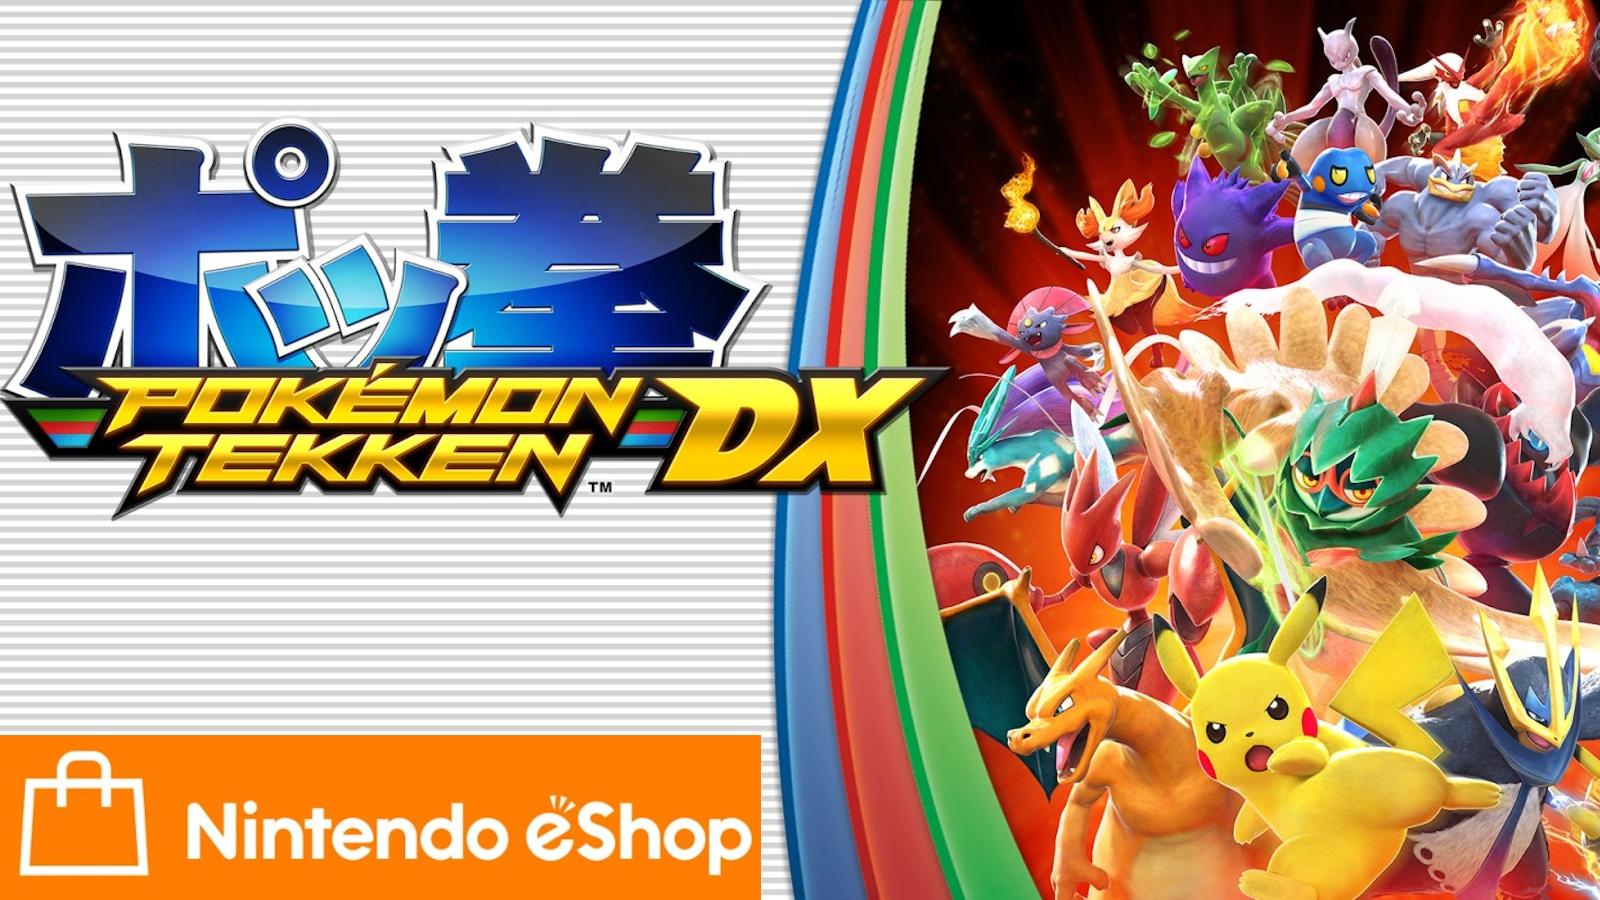 nintendo switch online - jetzt pokémon tekken dx gratis